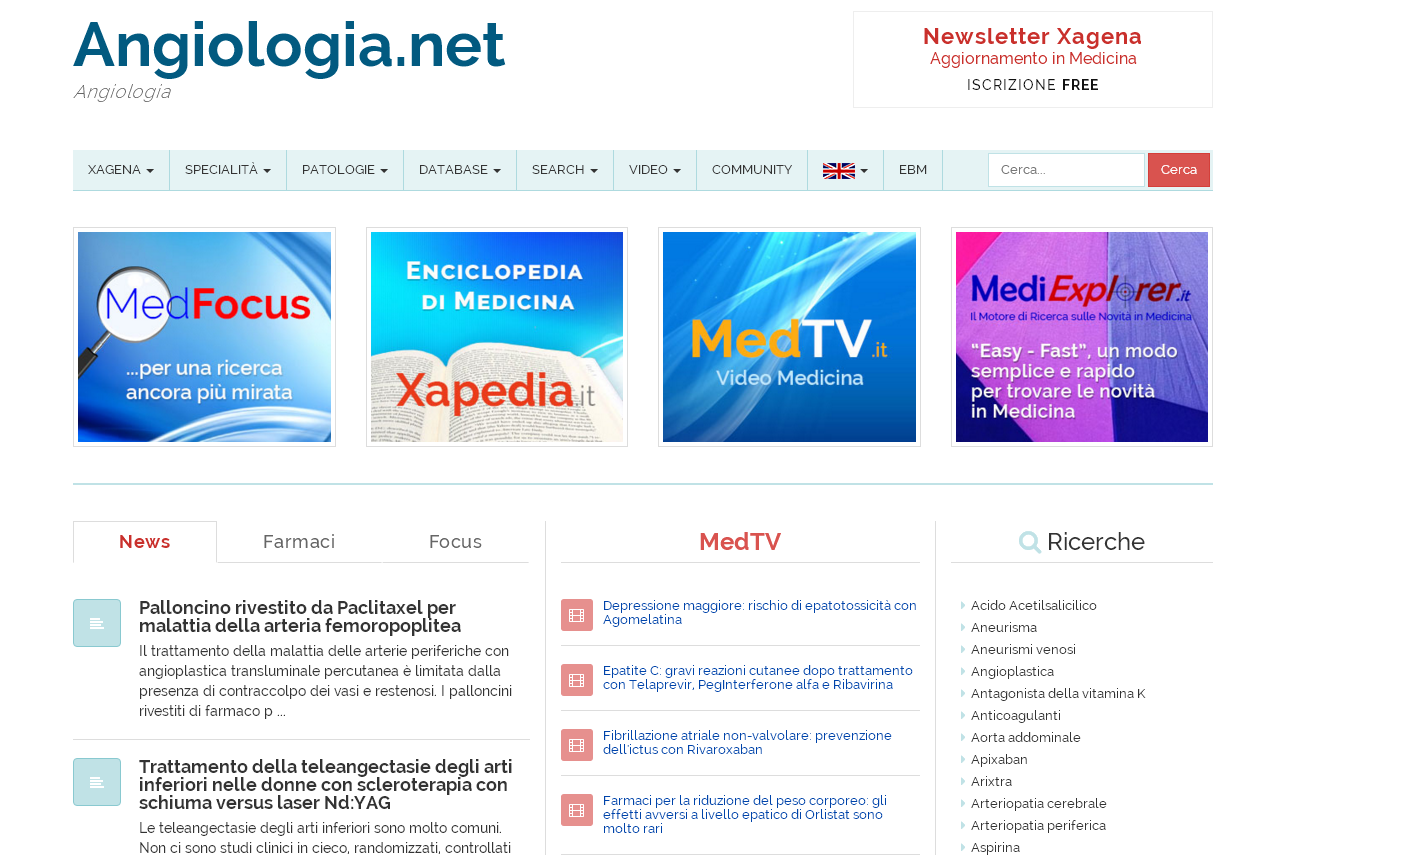 Angiologia.net